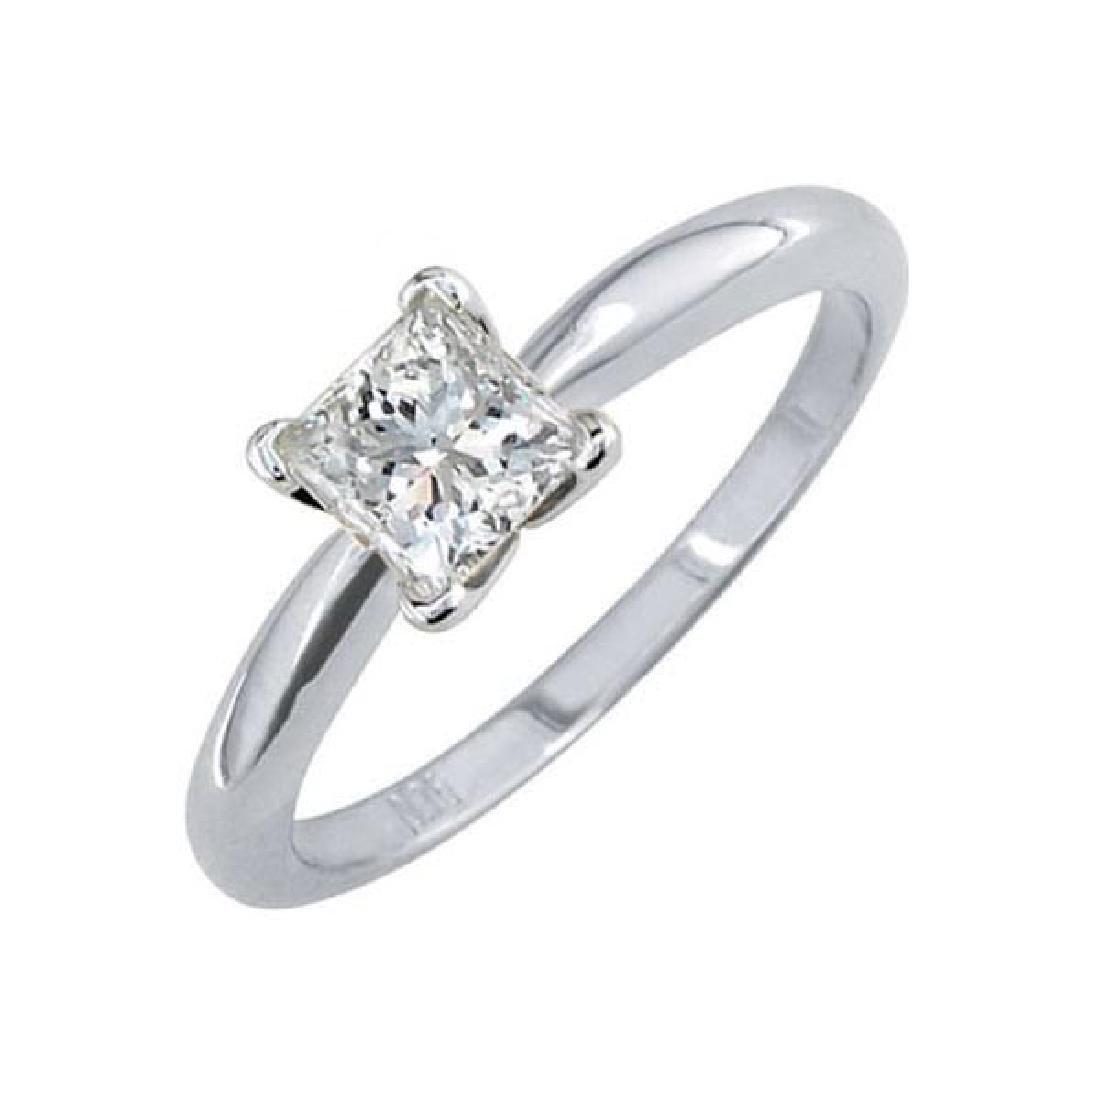 Certified 0.37 CTW Princess Diamond Solitaire 14k Ring